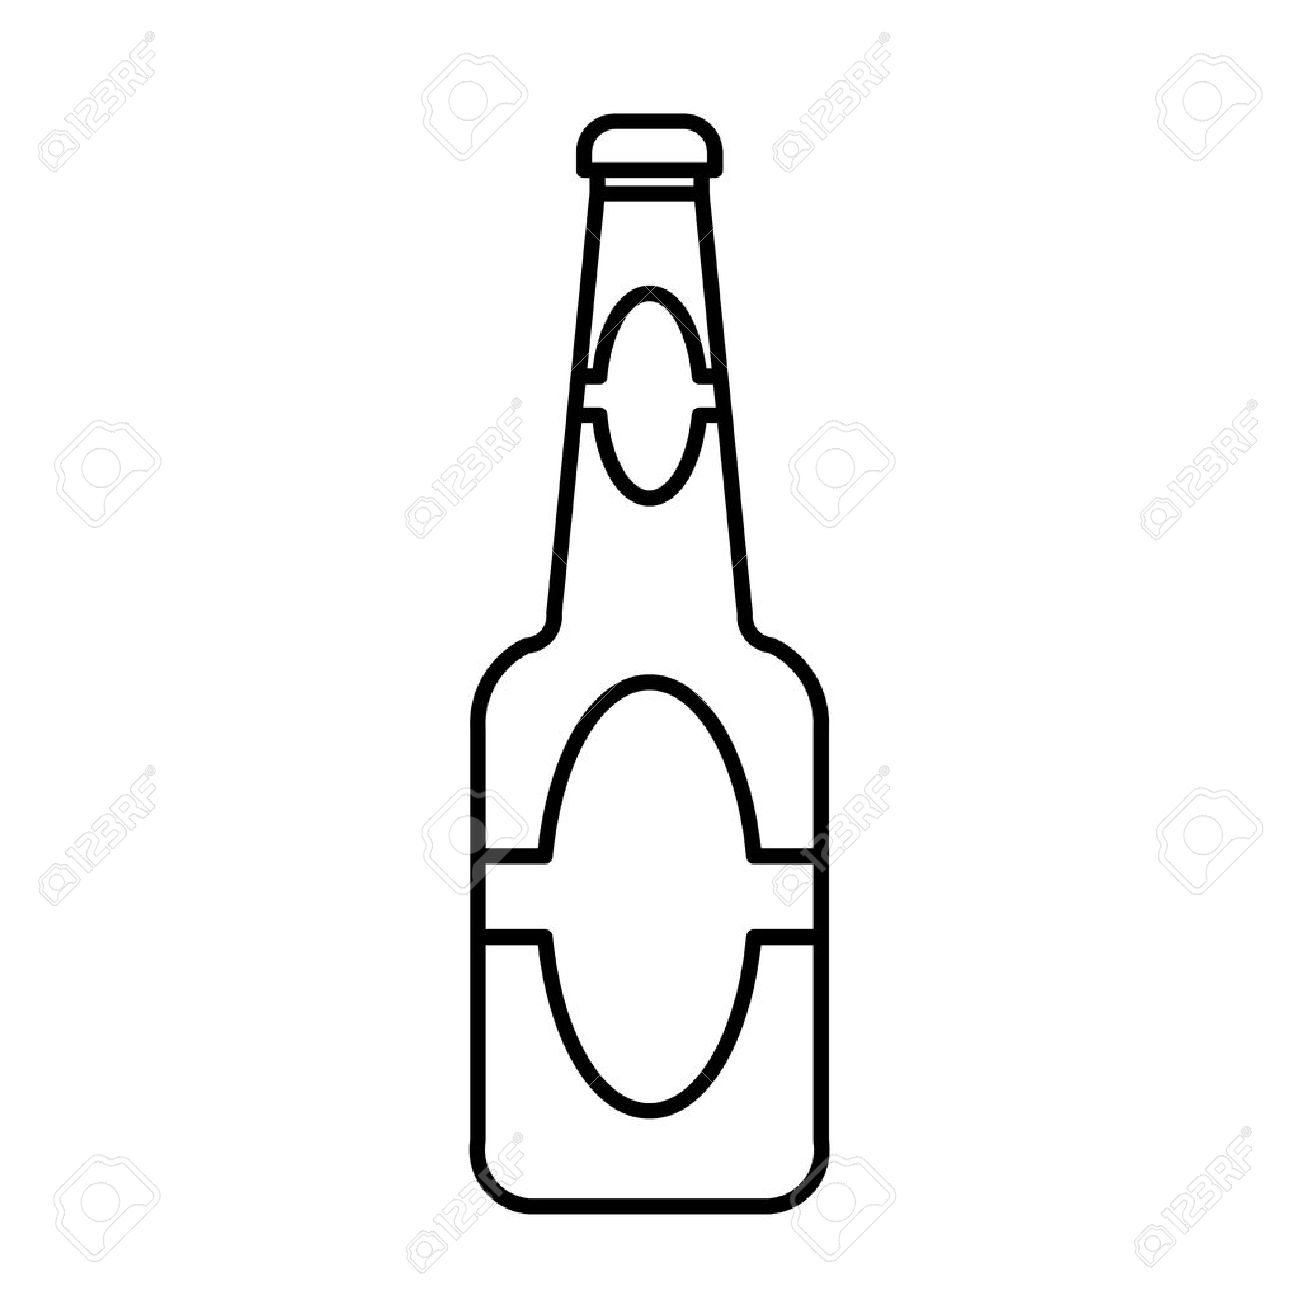 beer bottle outline vector.